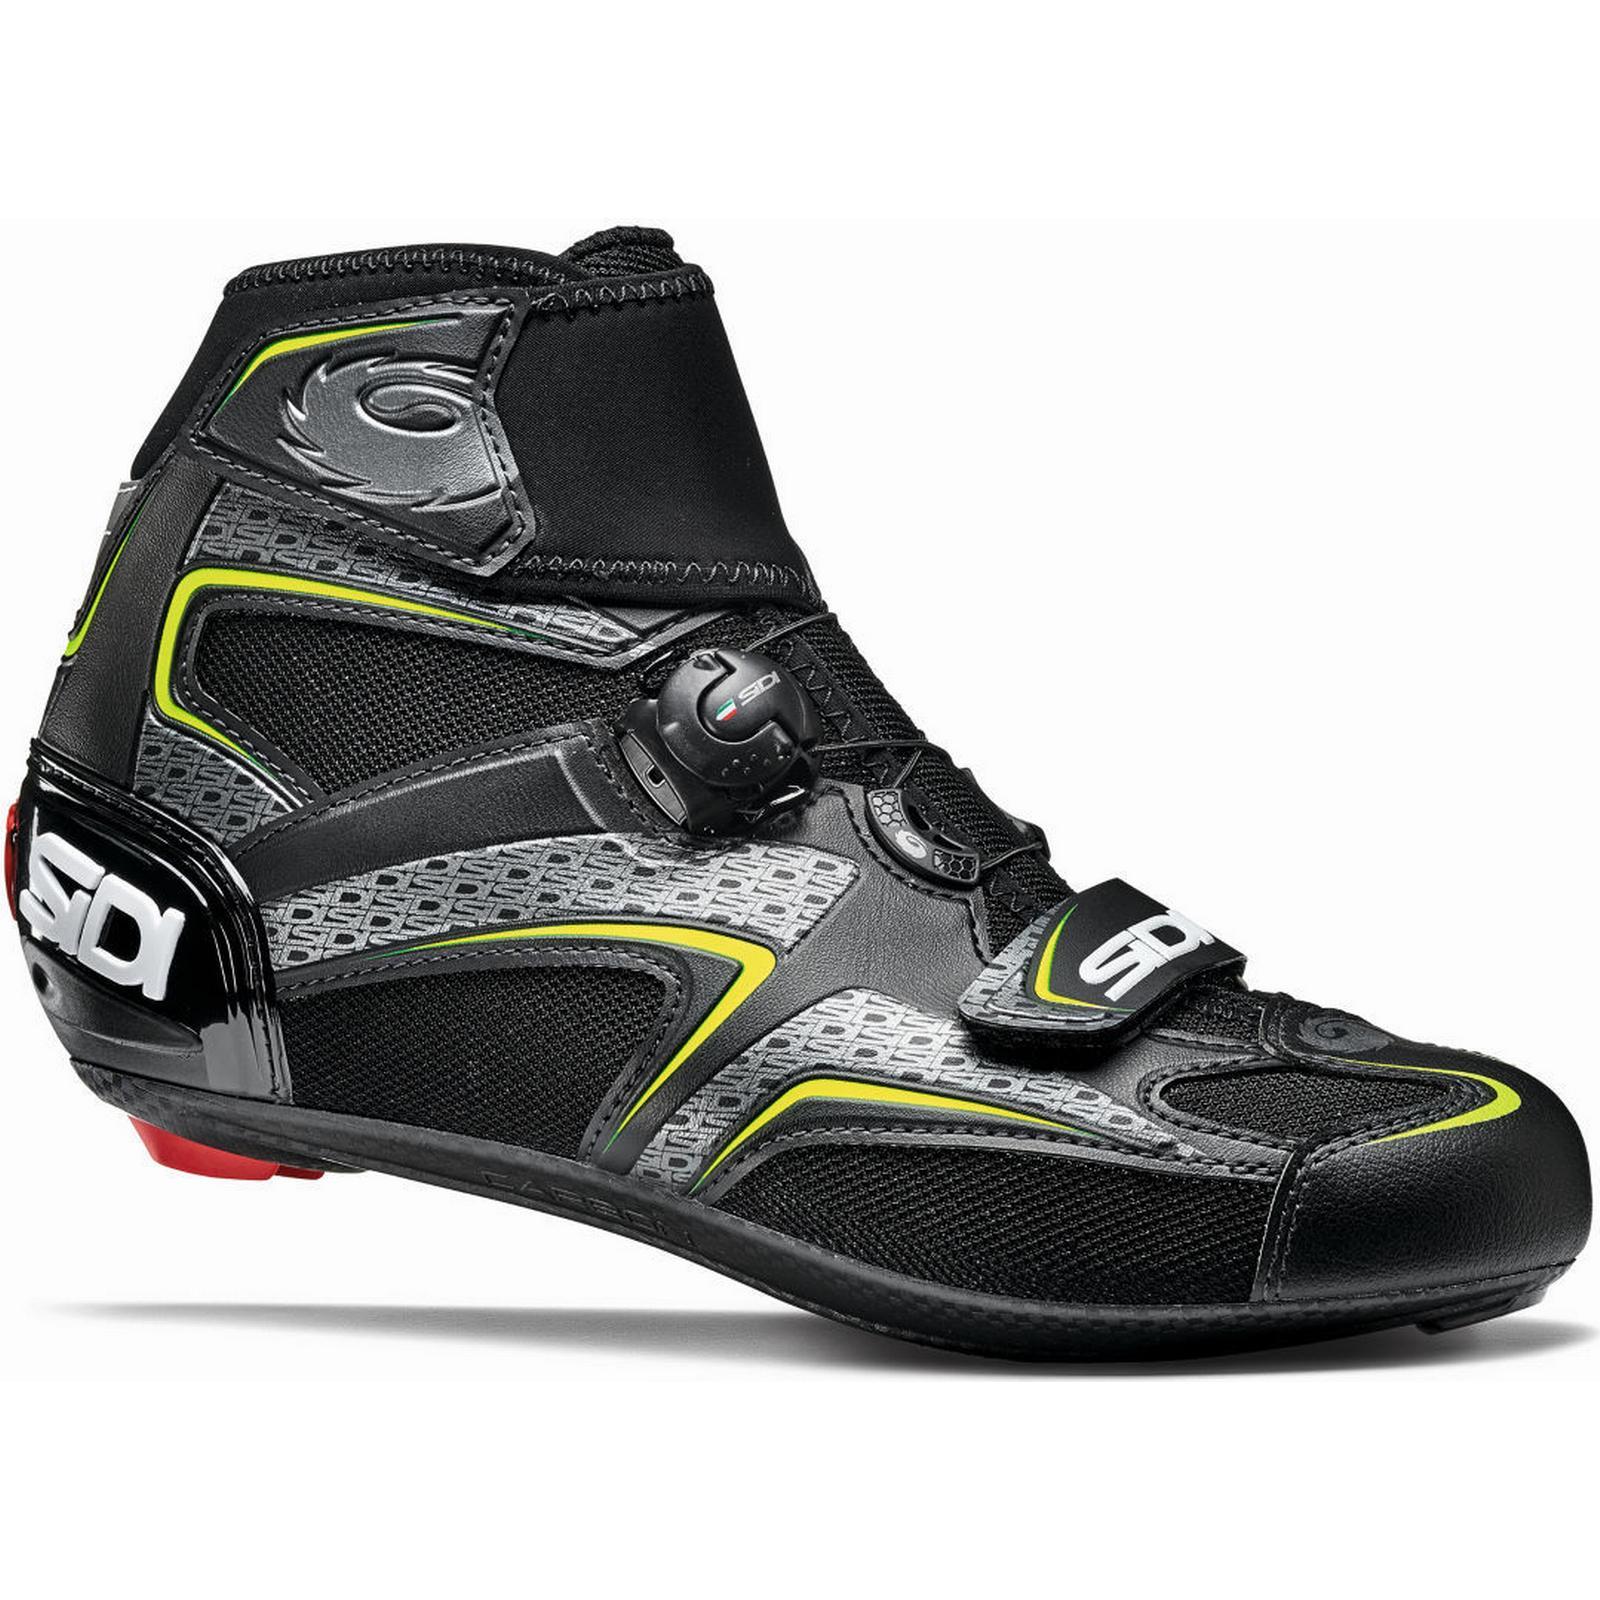 Wiggle Online Cycle Shop Sidi Zero Shoes Gore Road Shoes Cycling Shoes Zero c7f73a